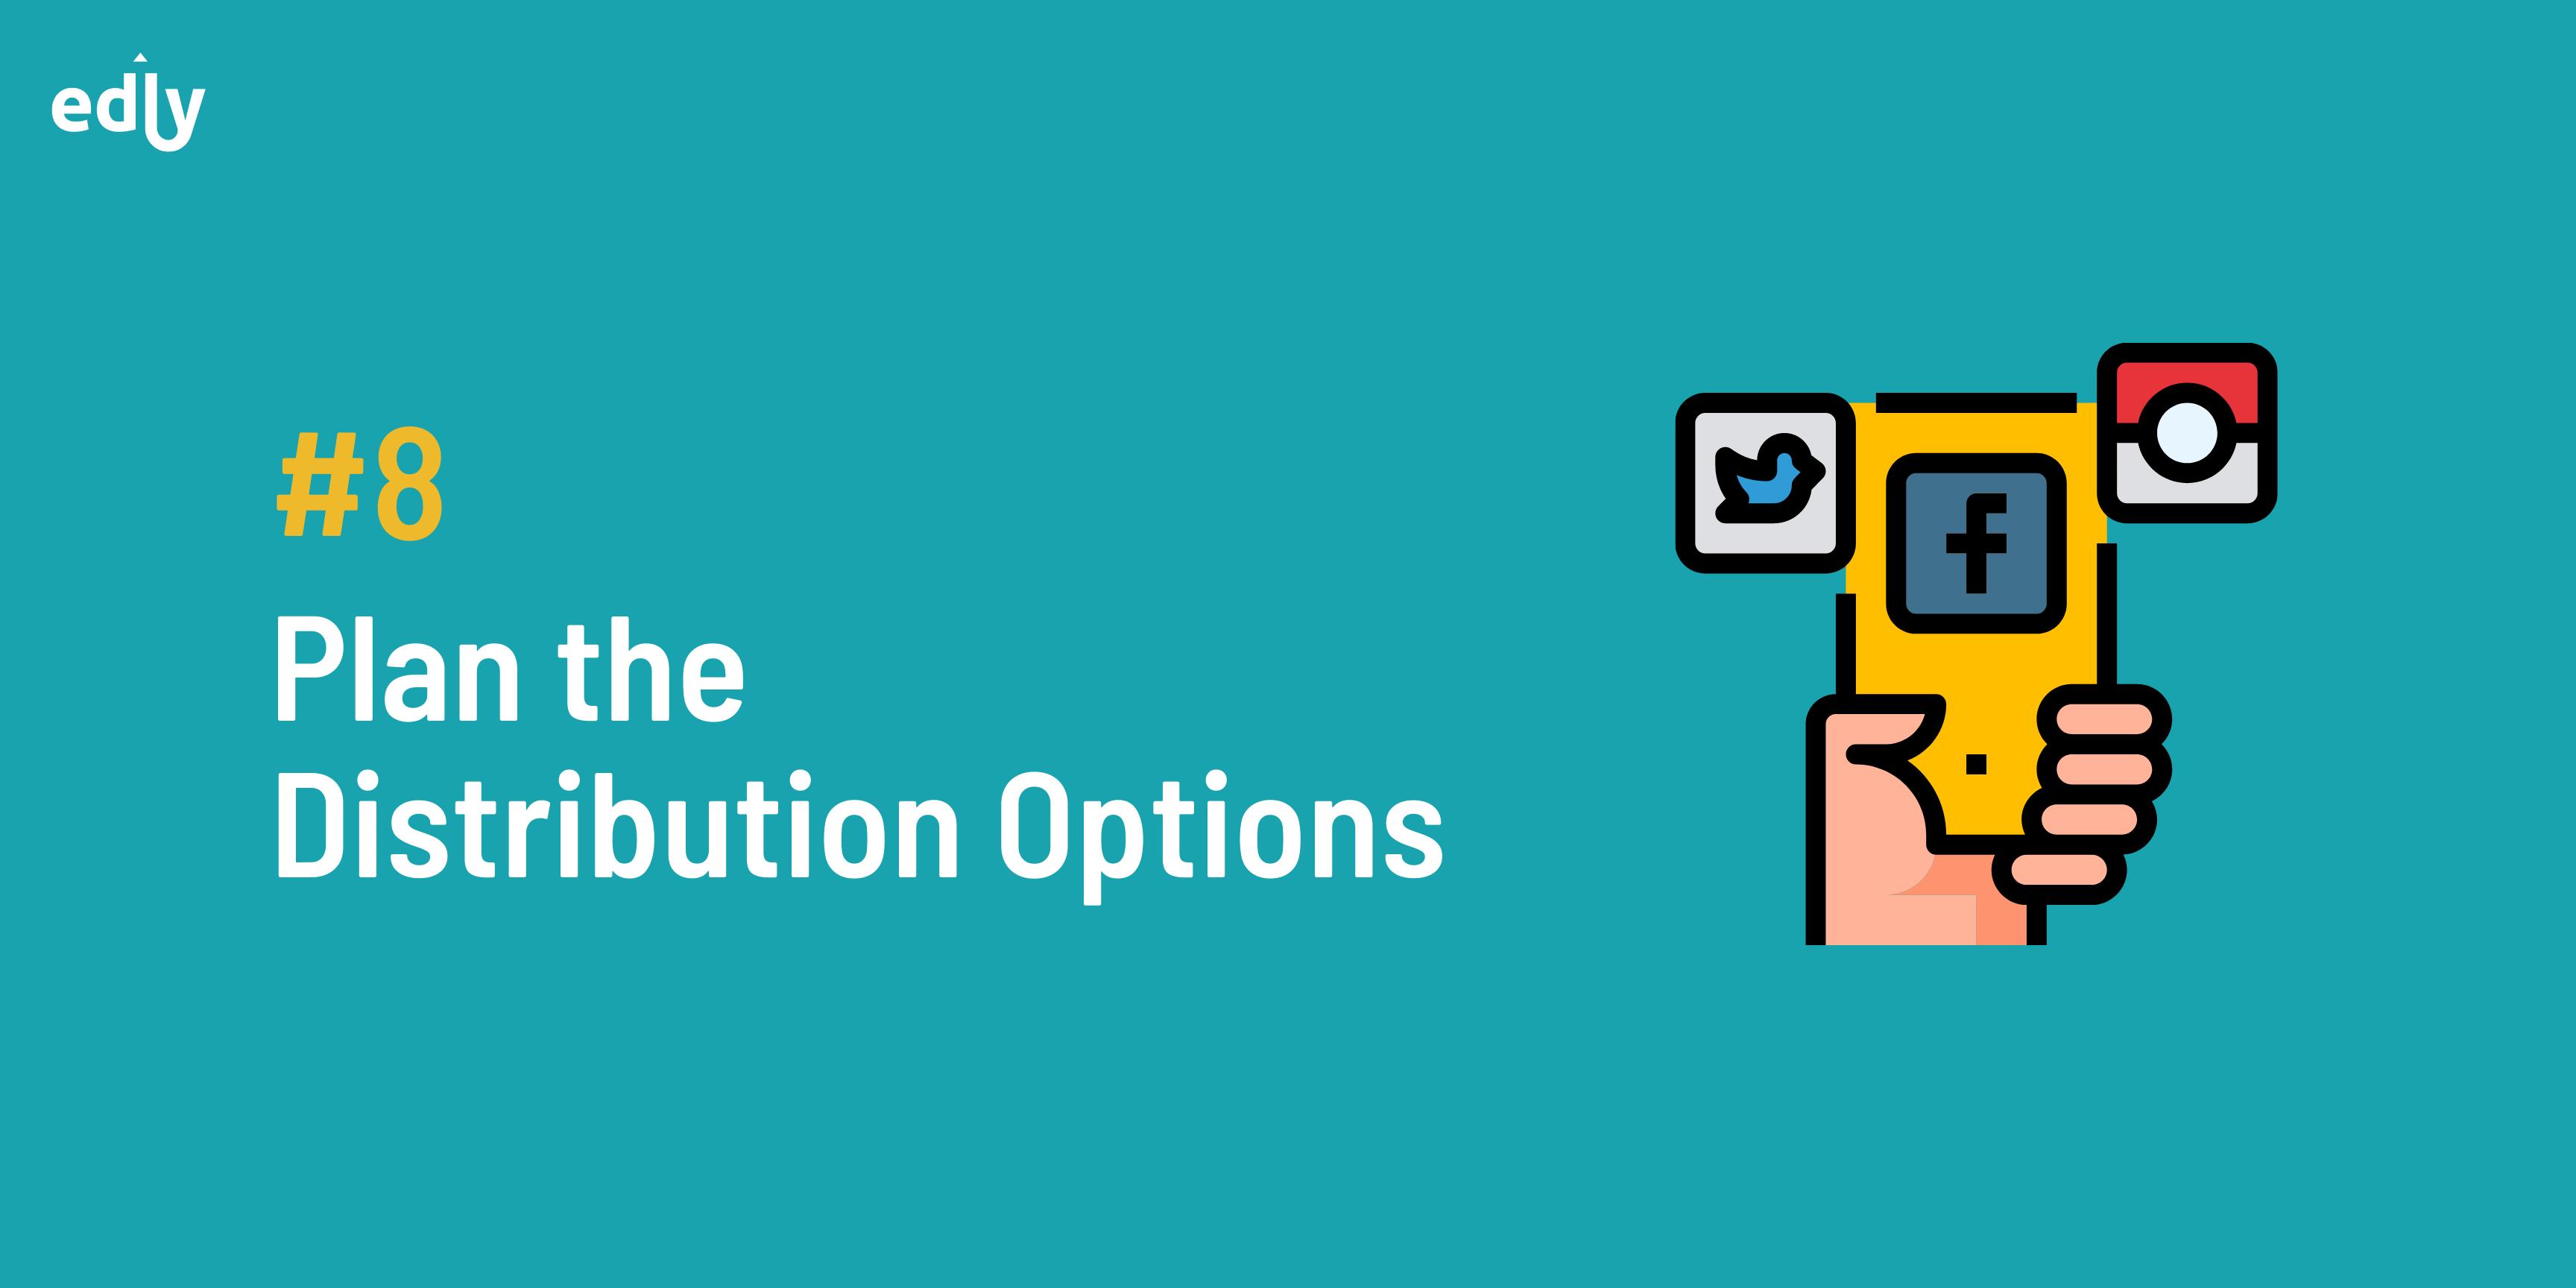 Plan the Distribution Options